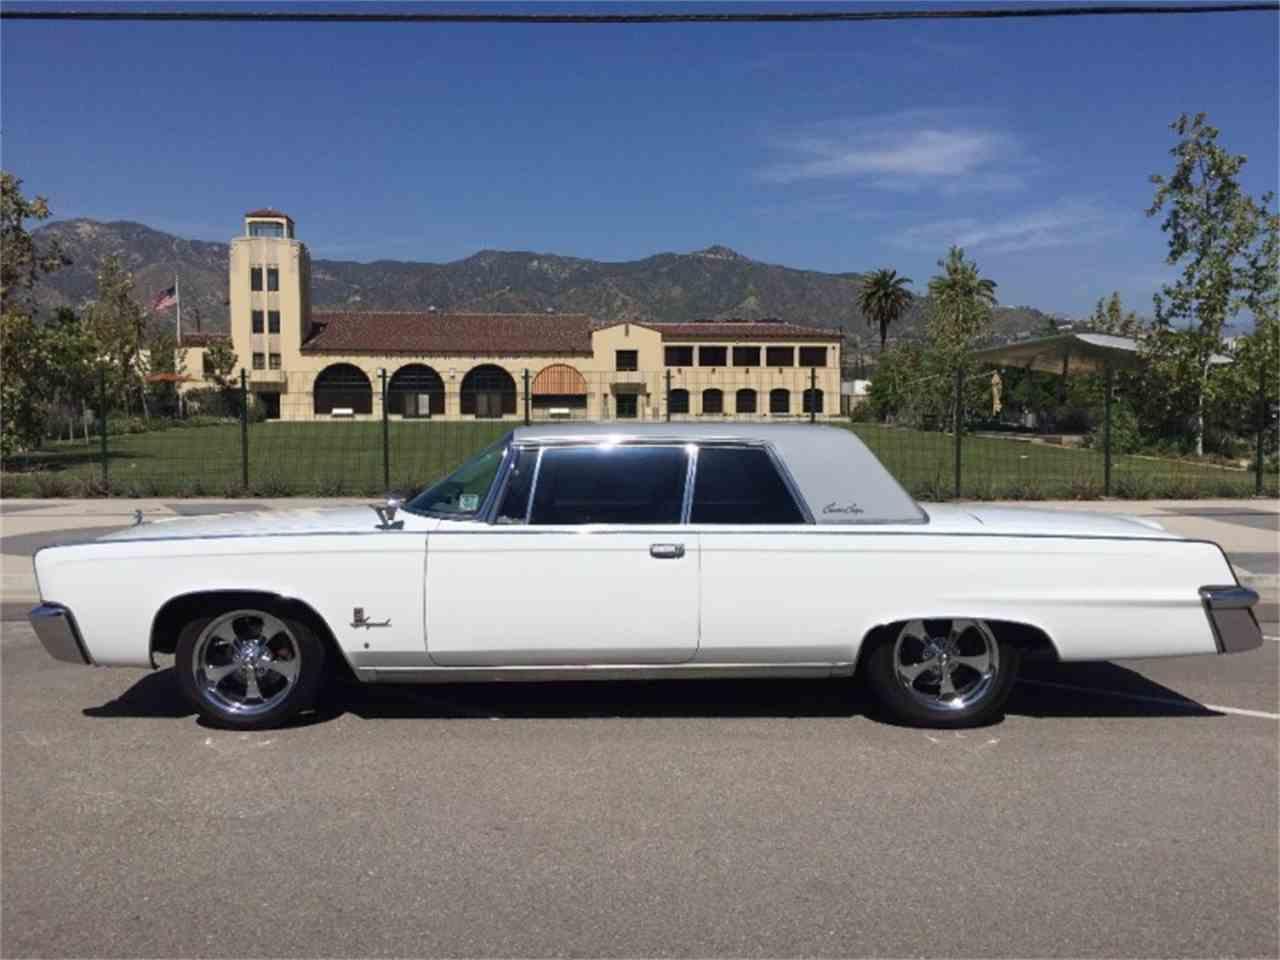 1964 Chrysler Imperial for Sale | ClassicCars.com | CC-1020164